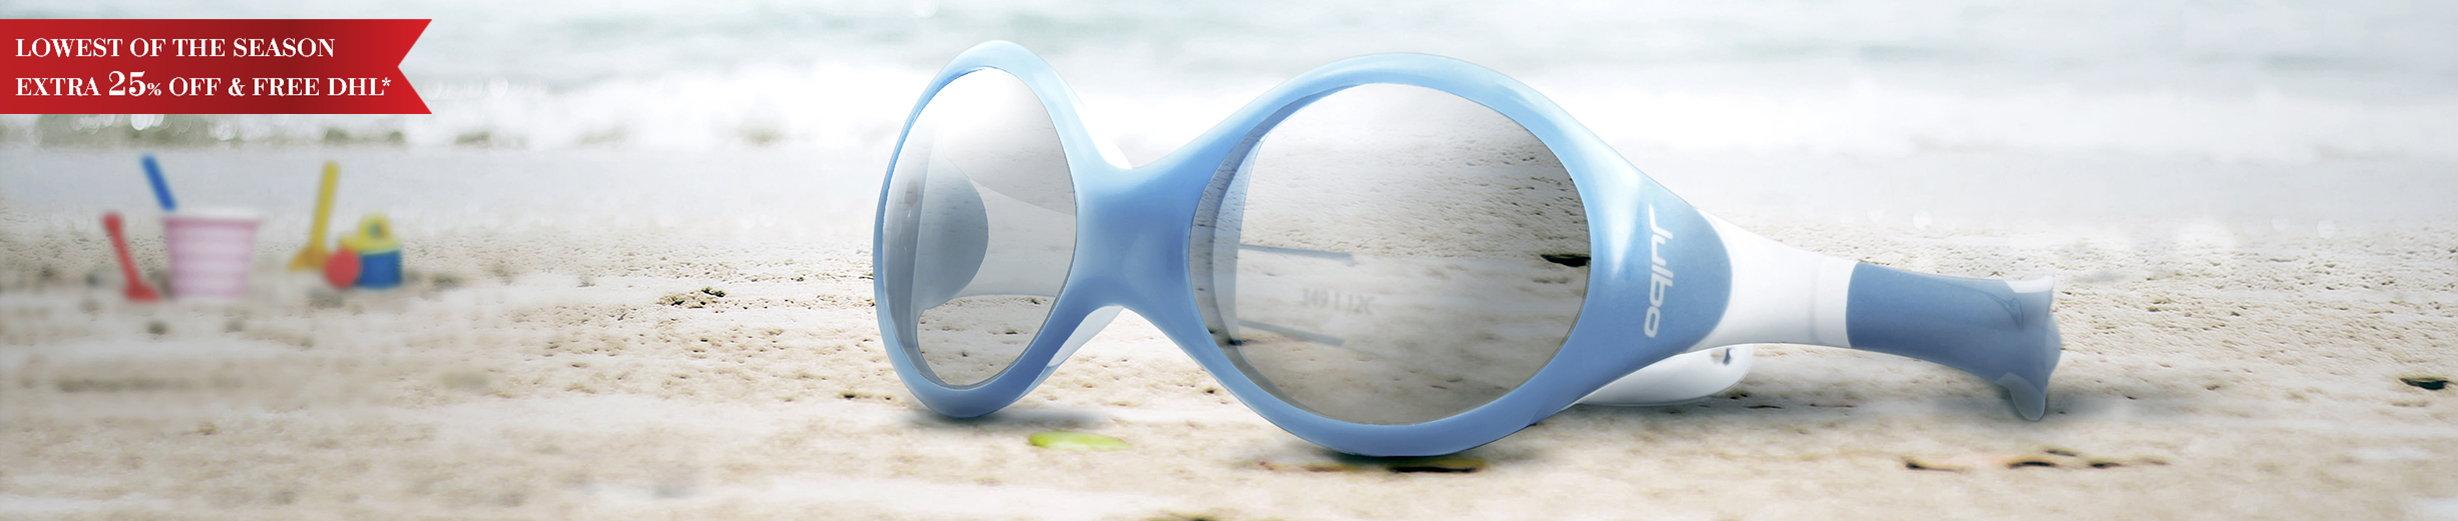 Glassesgallery - Kids sports glasses banner